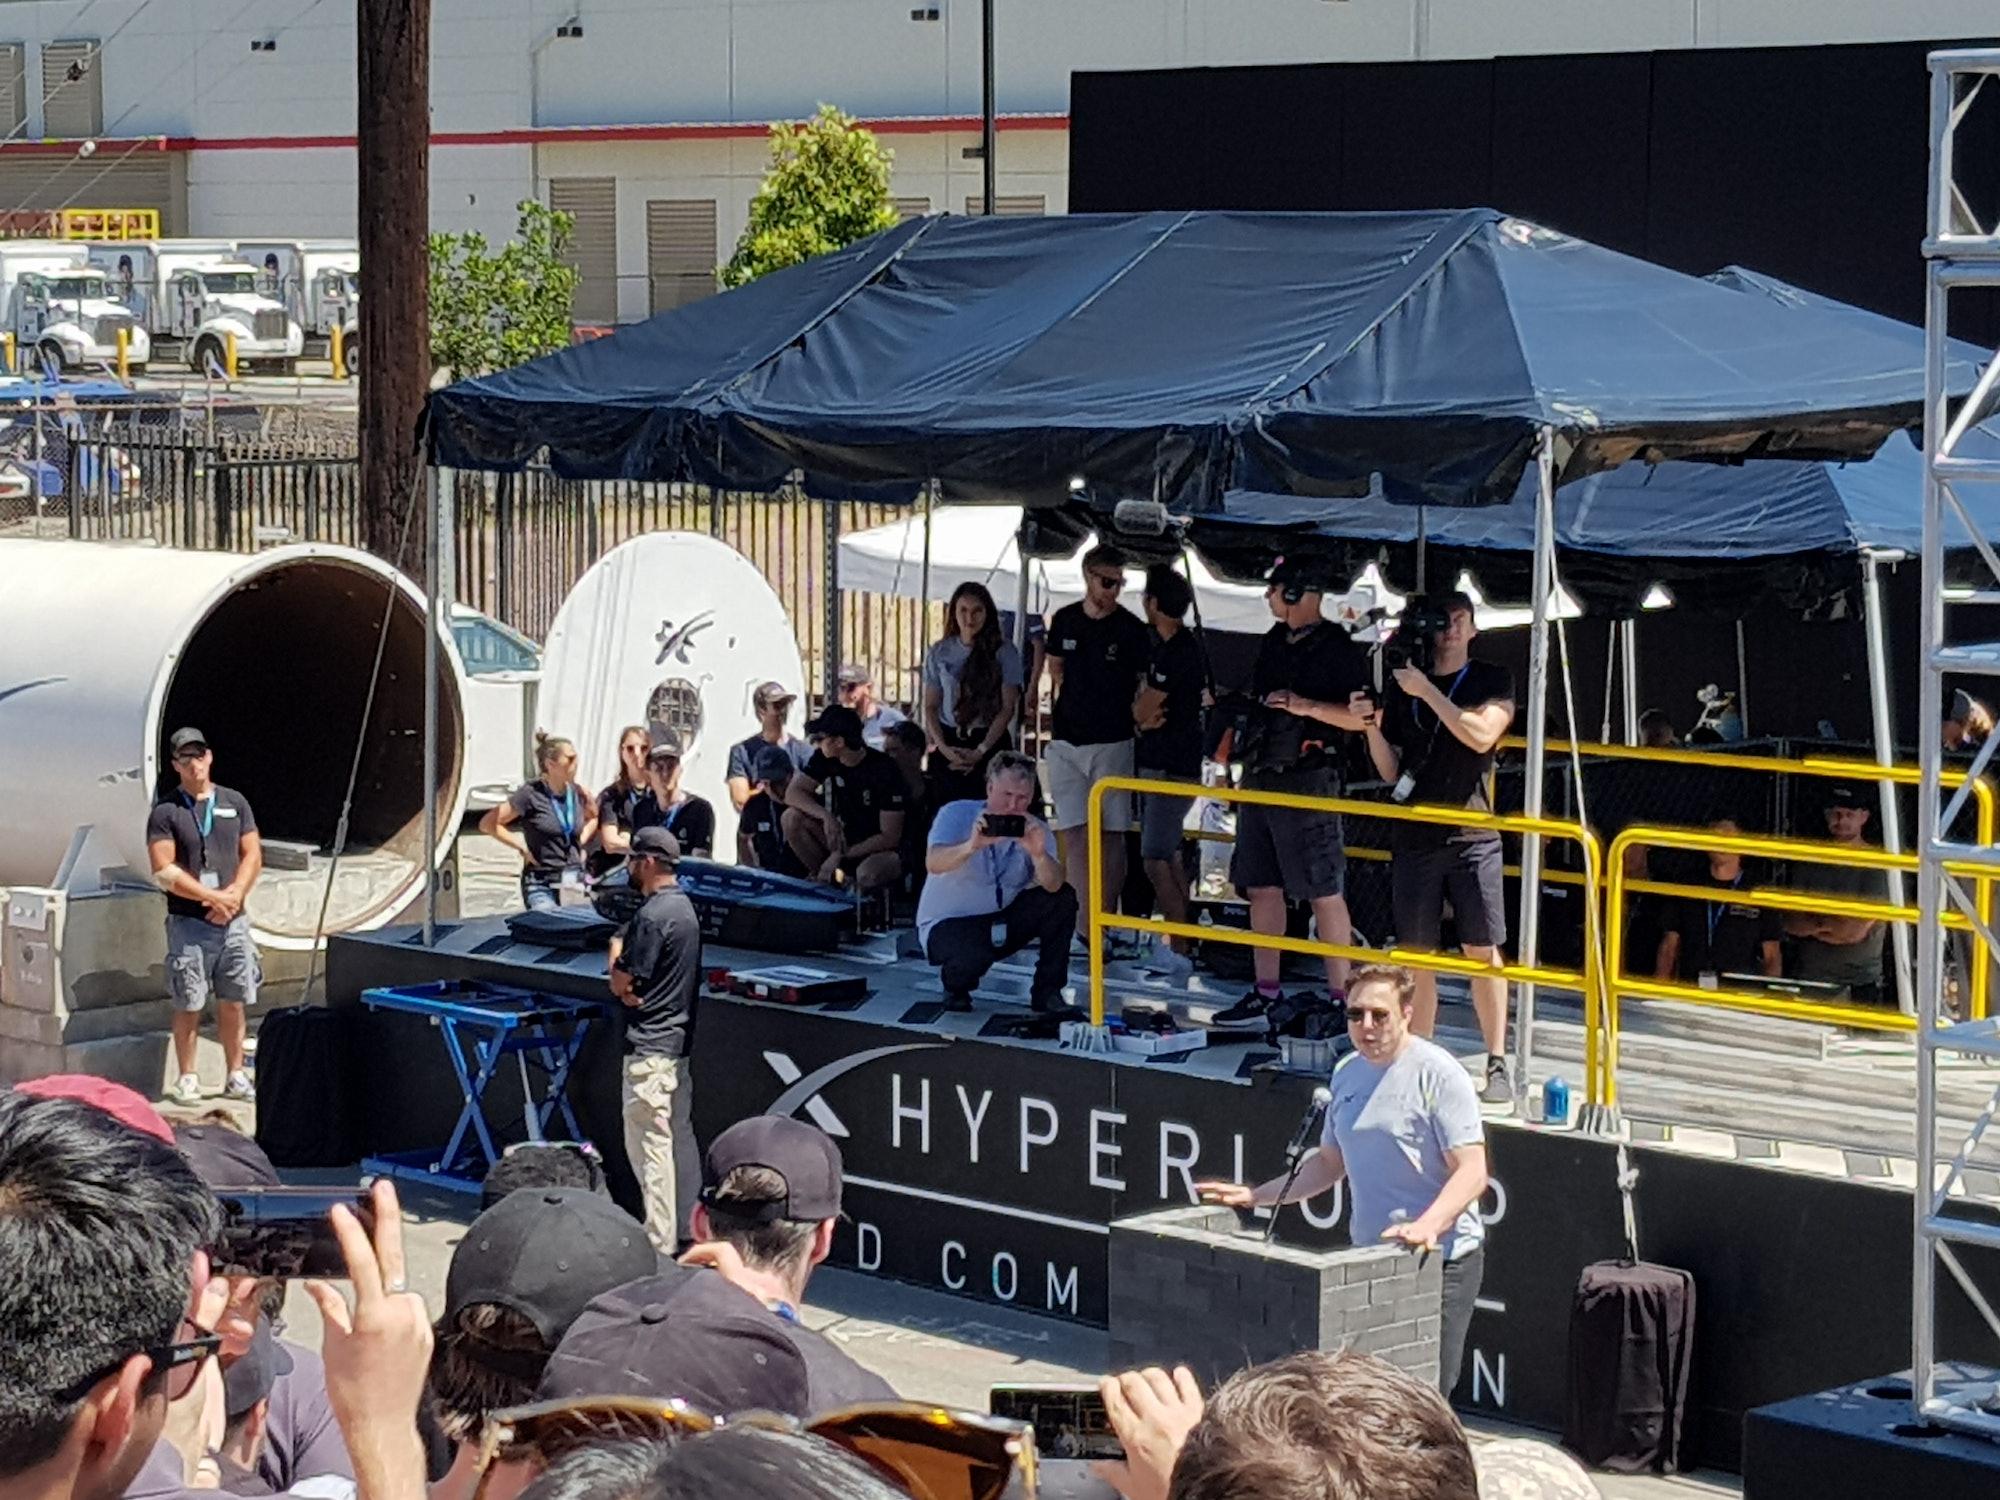 Elon Musk at the podium.